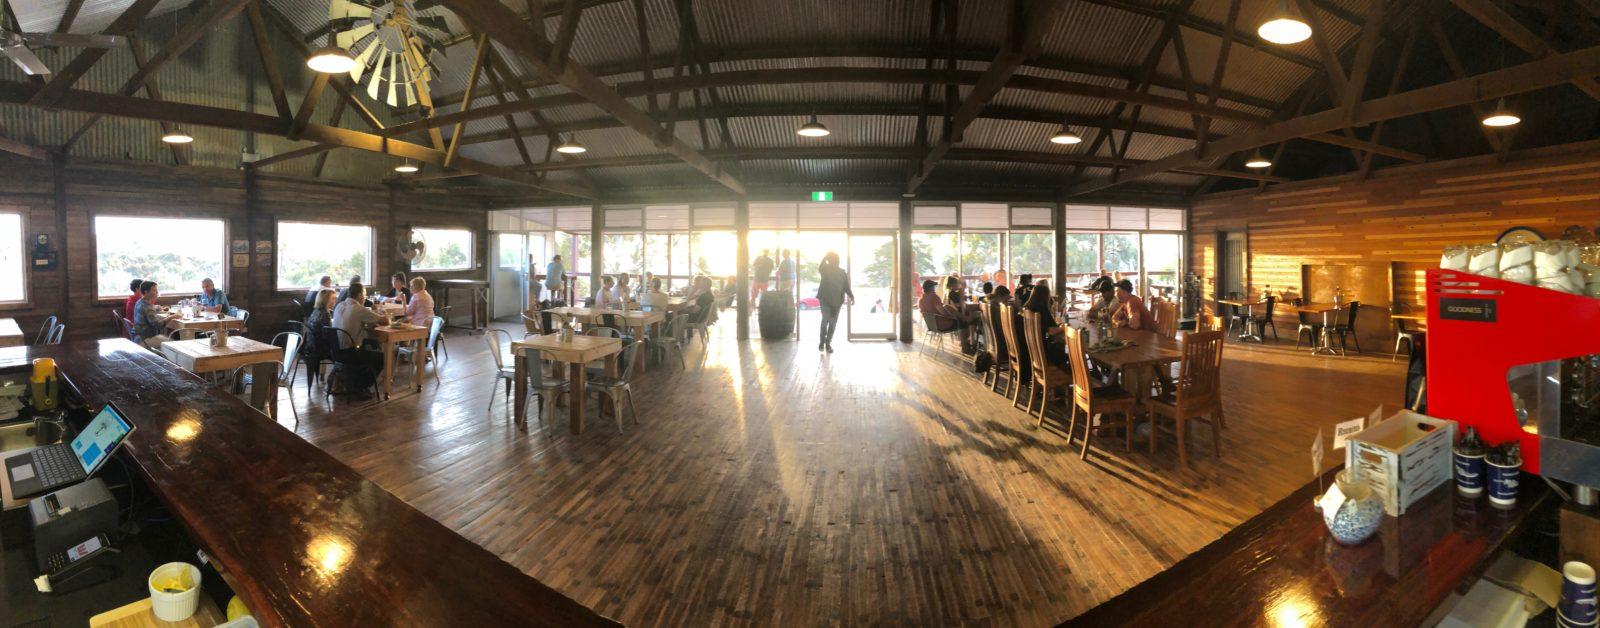 Forktree Brewing indoor dining area